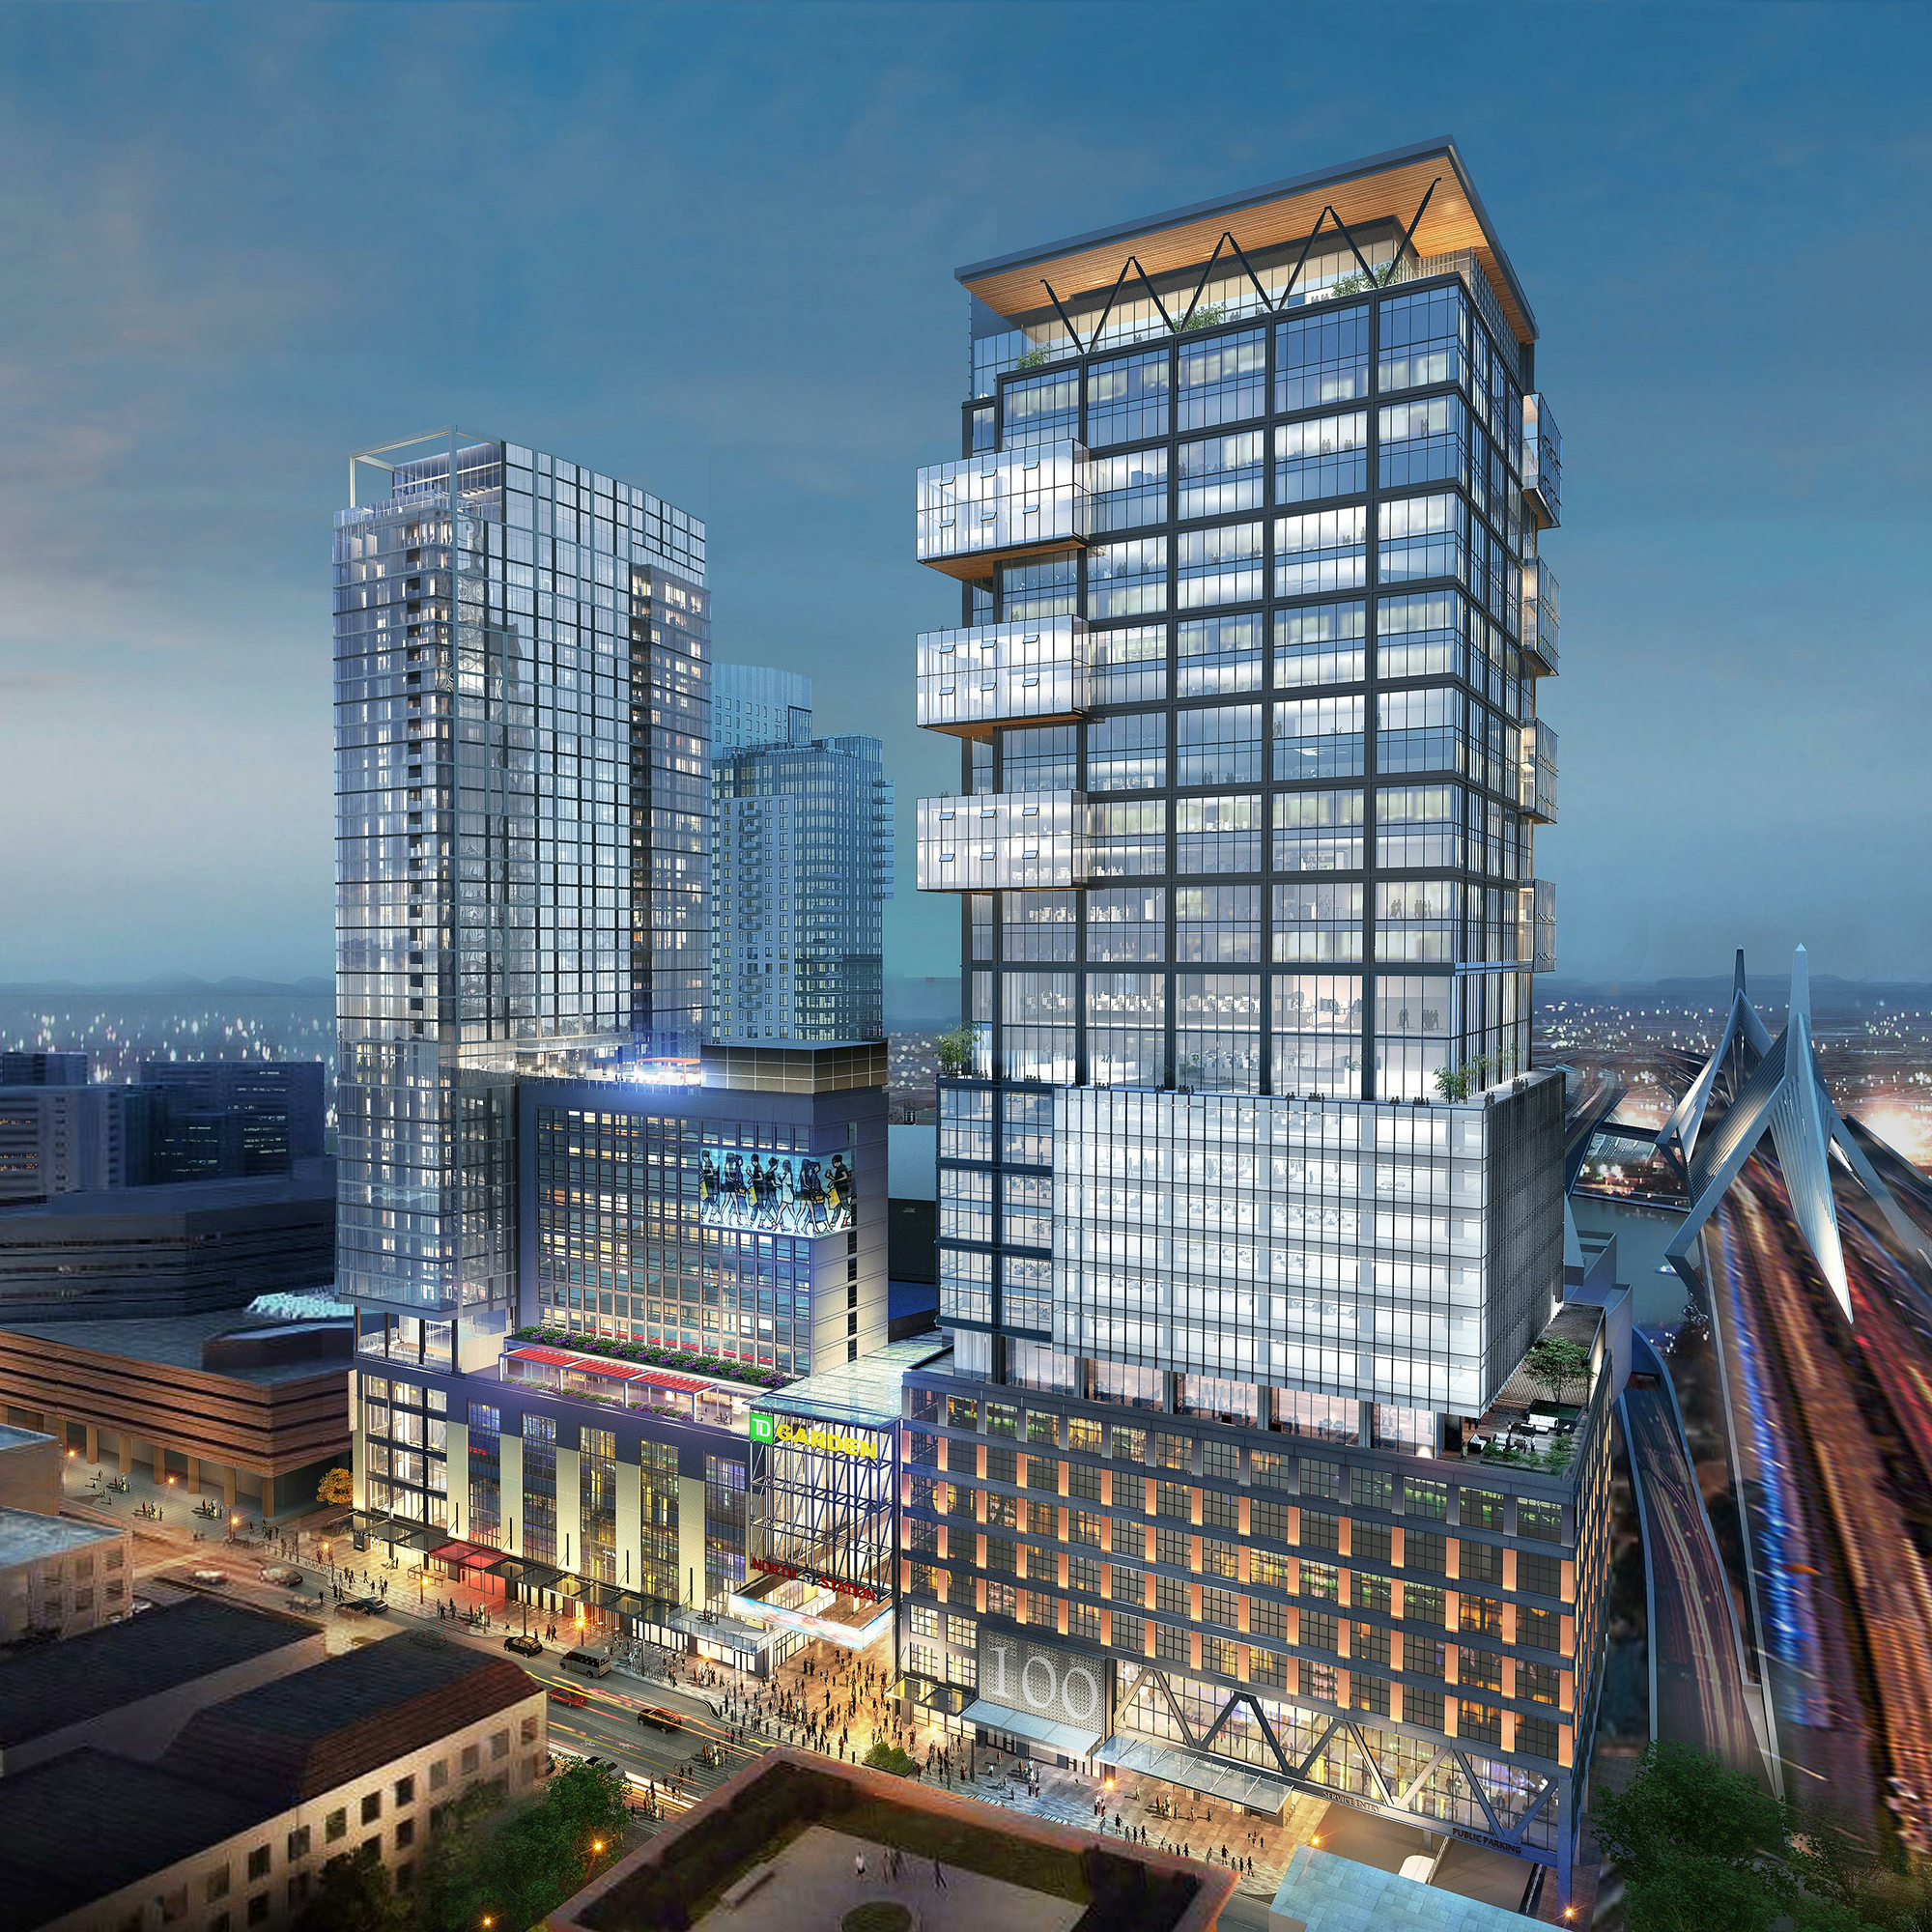 The HUB on Causeway – Boston Garden Office Tower